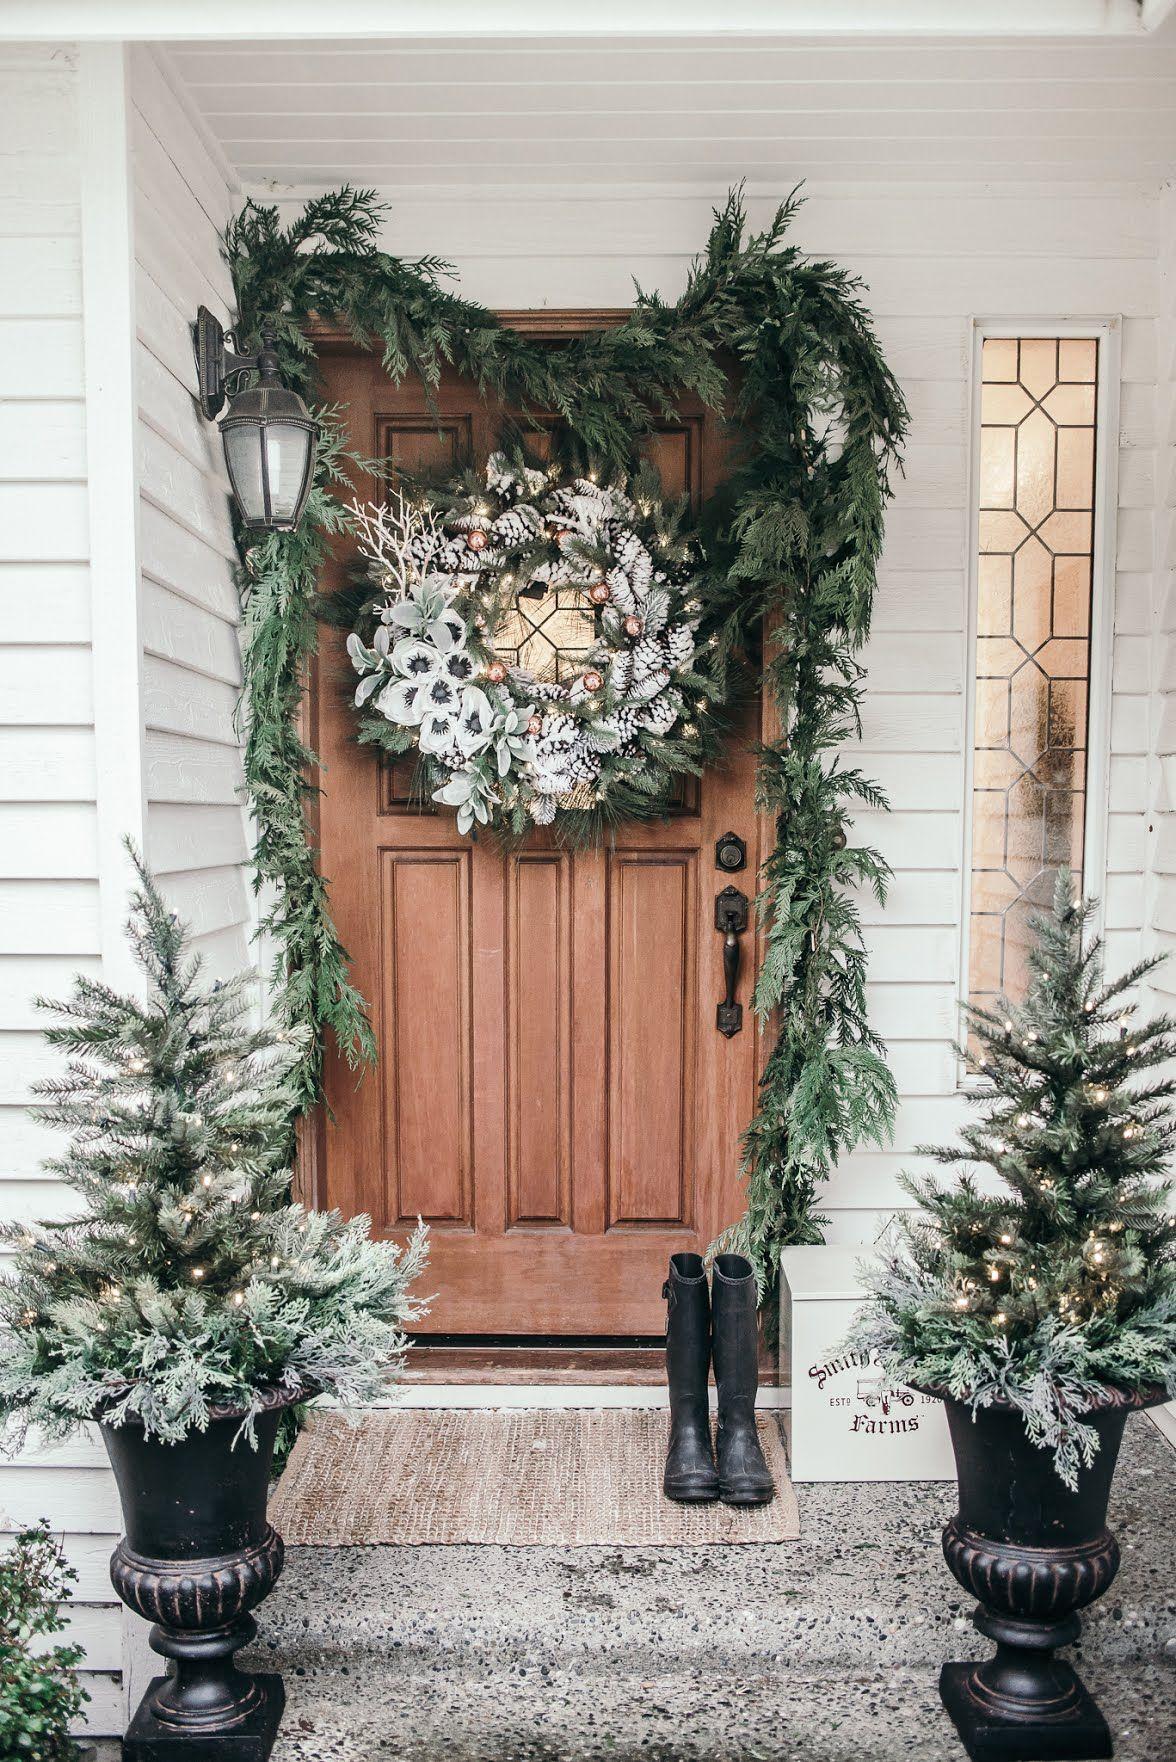 Holiday Home Tour Christmas Decor Ideas CHRISTmas